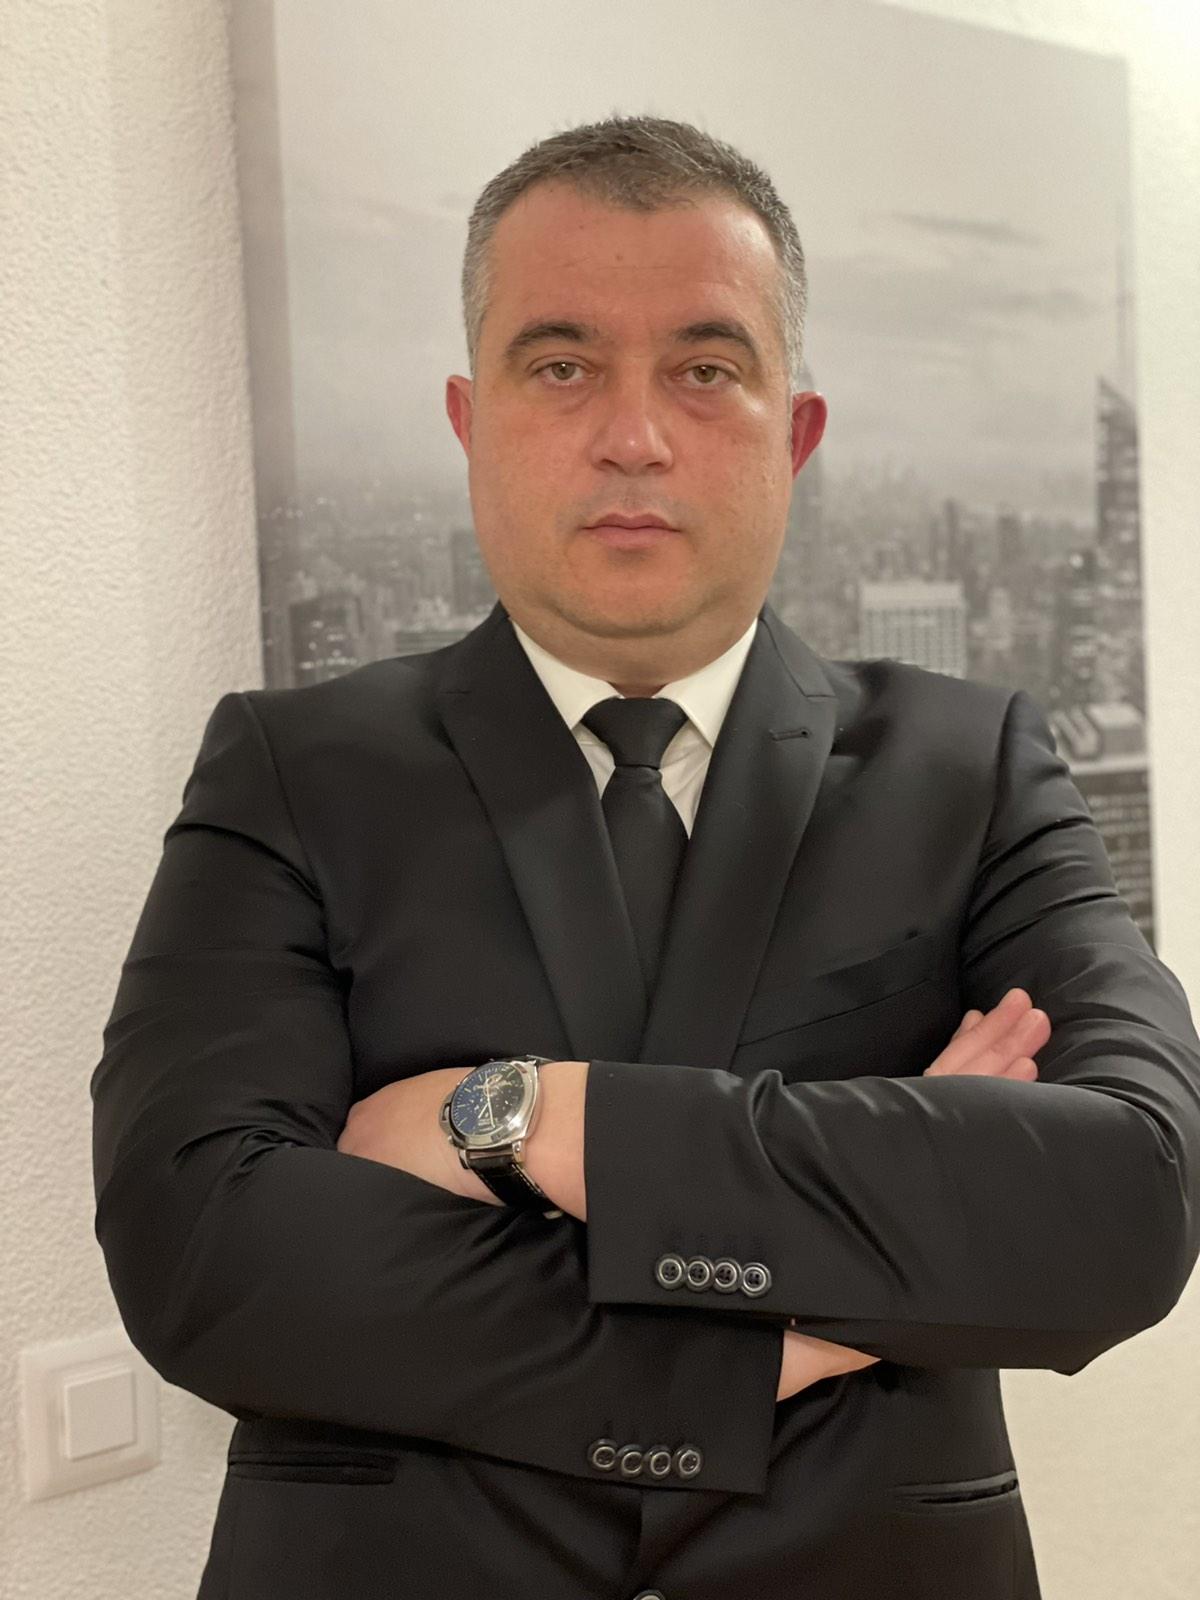 Stefan Stoilov